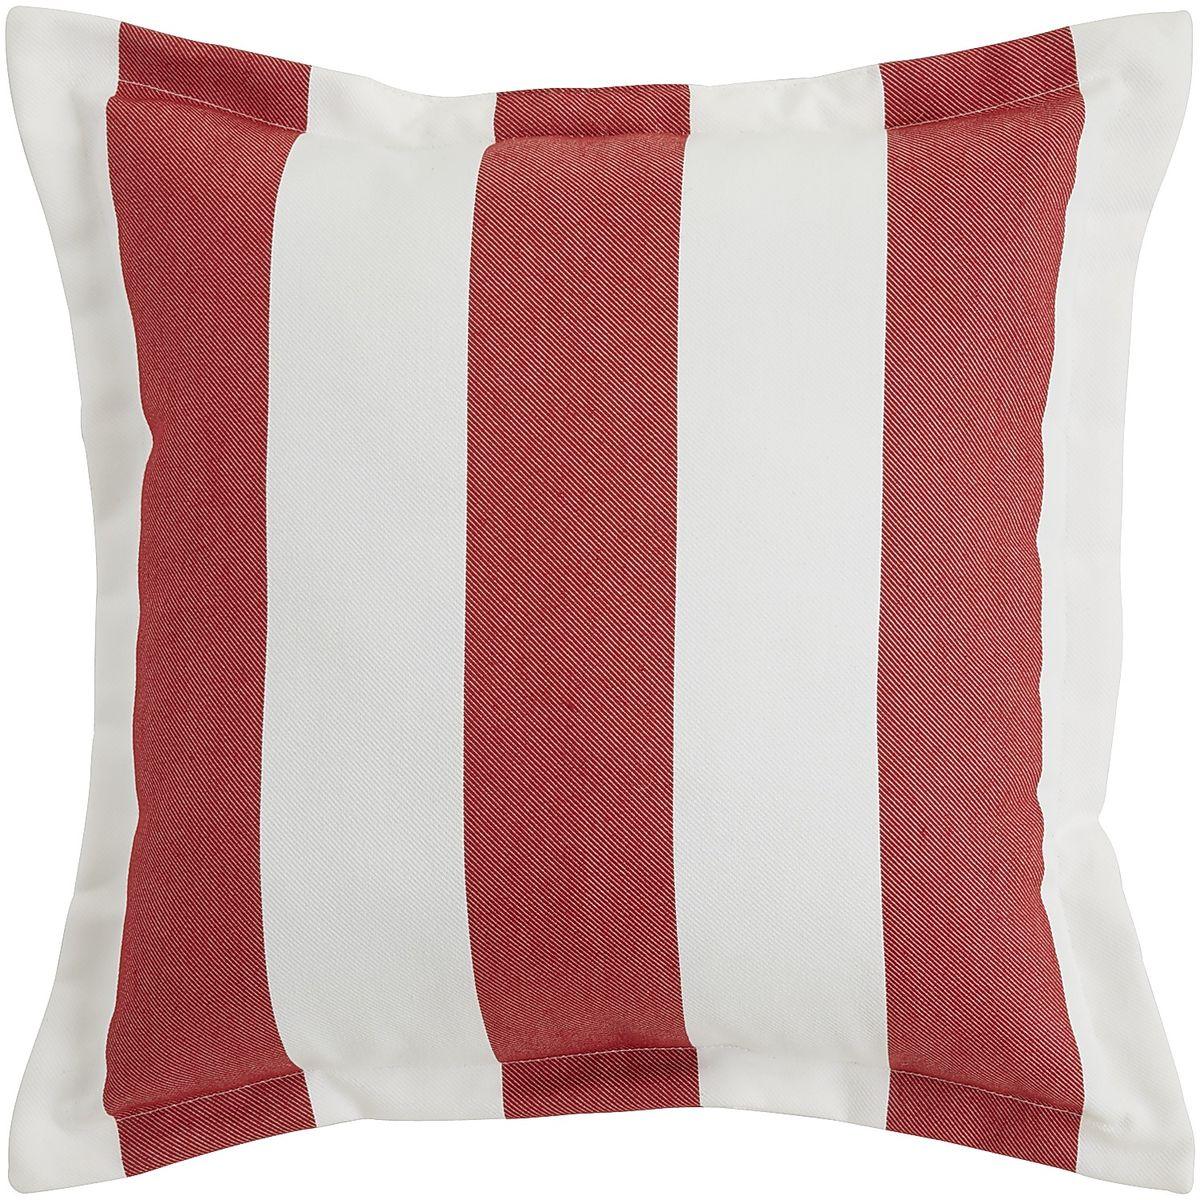 Pier1 -  Dover Cherry Pillow  $35